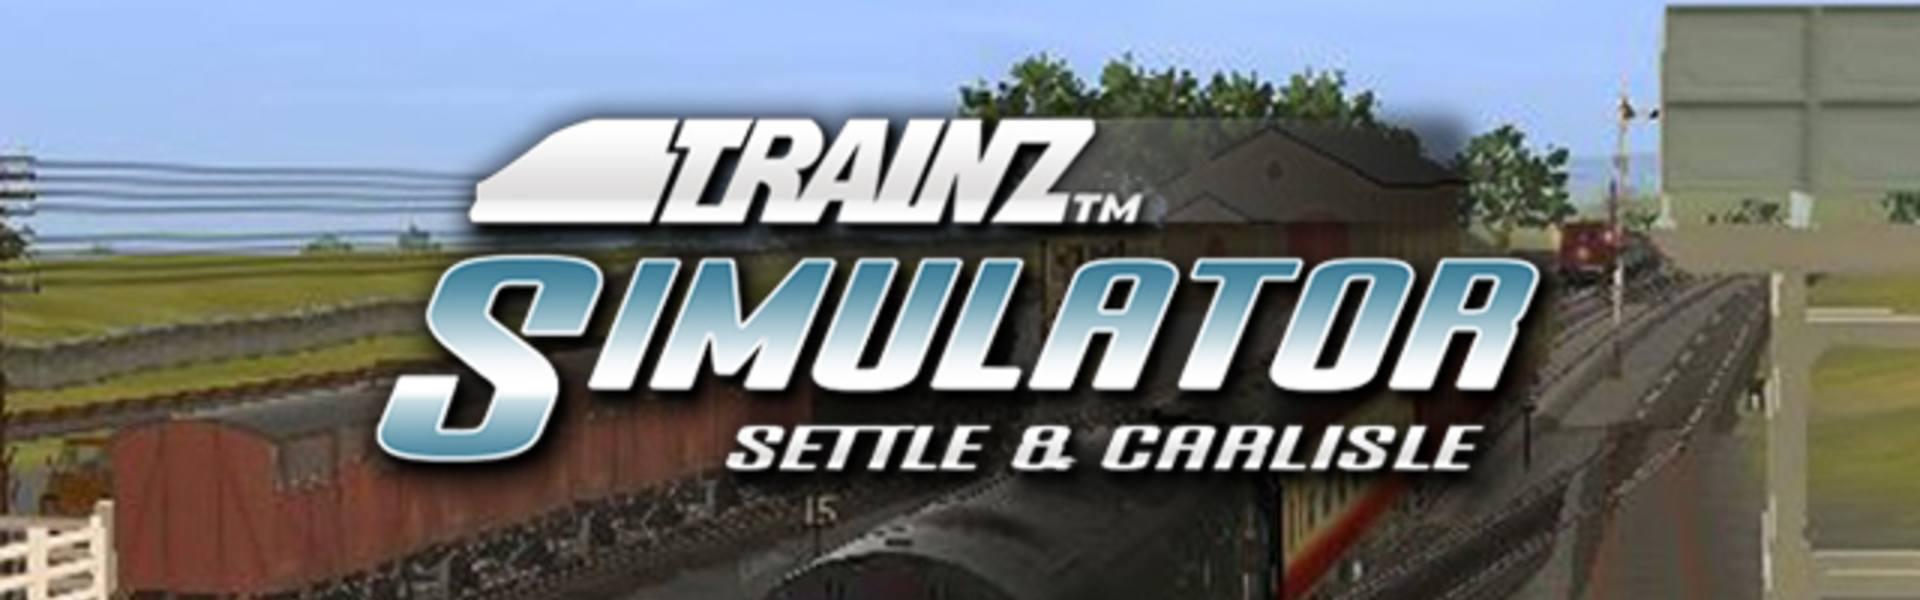 Trainz Simulator: Settle and Carlisle Steam Key GLOBAL